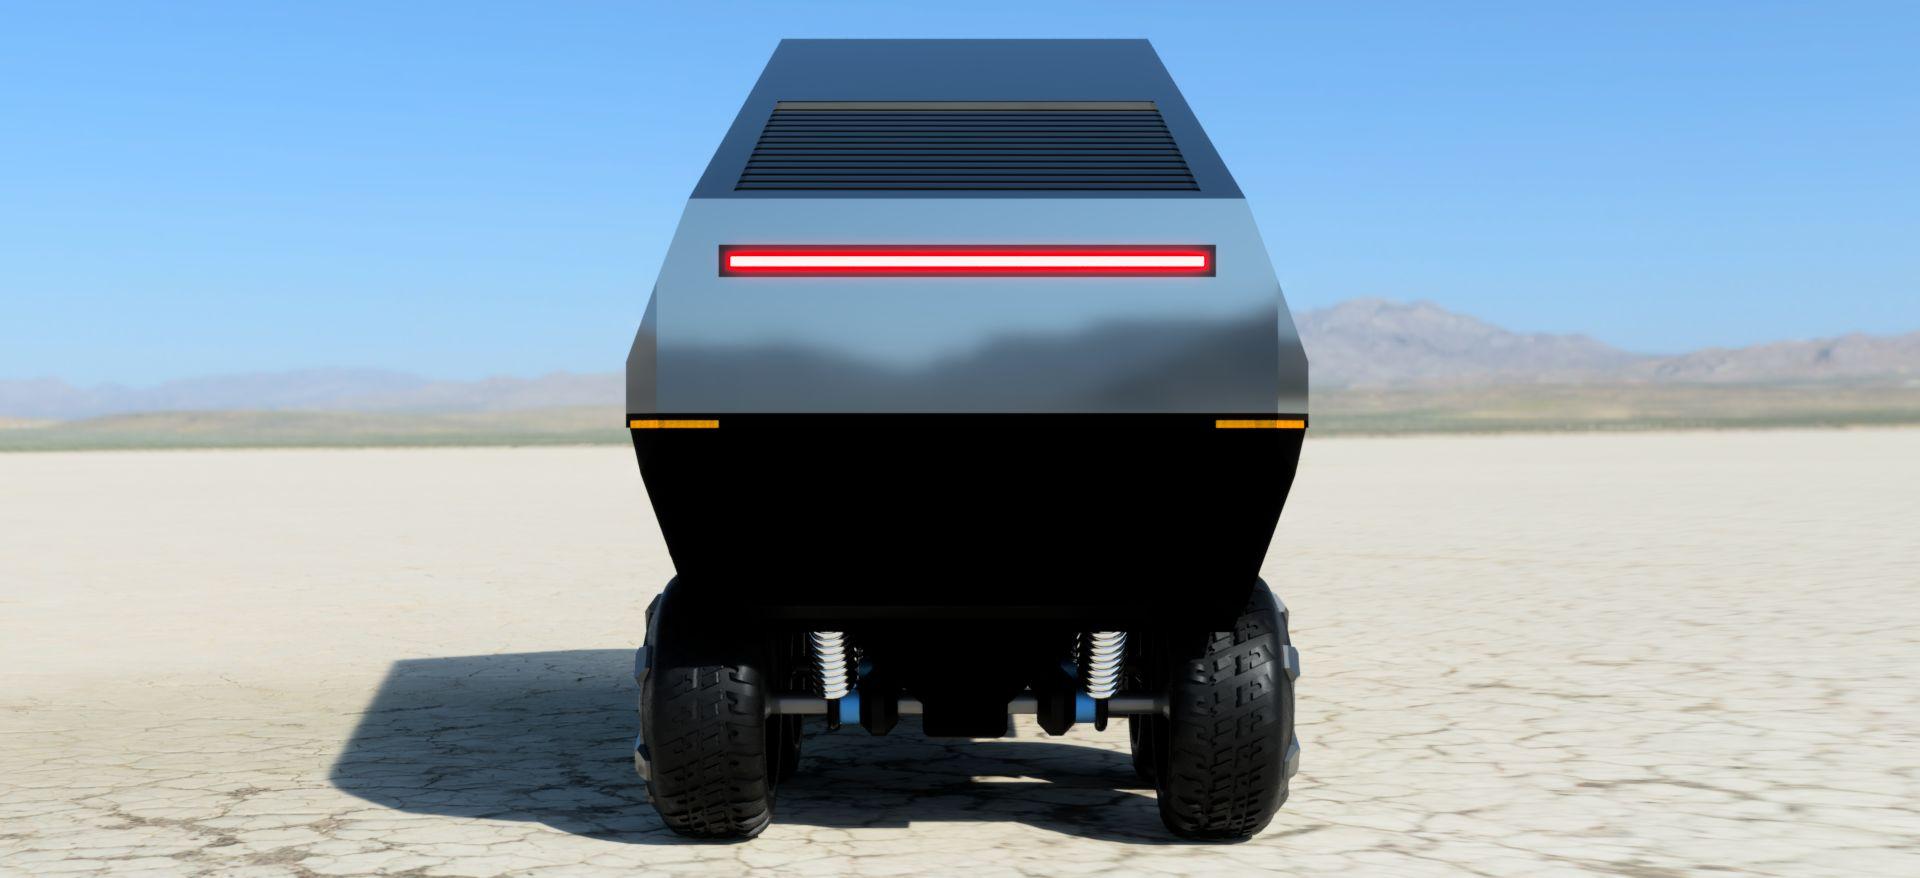 Tesla-semi-cybertruck-2020-apr-14-09-55-53am-000-customizedview36081614103-png-3500-3500